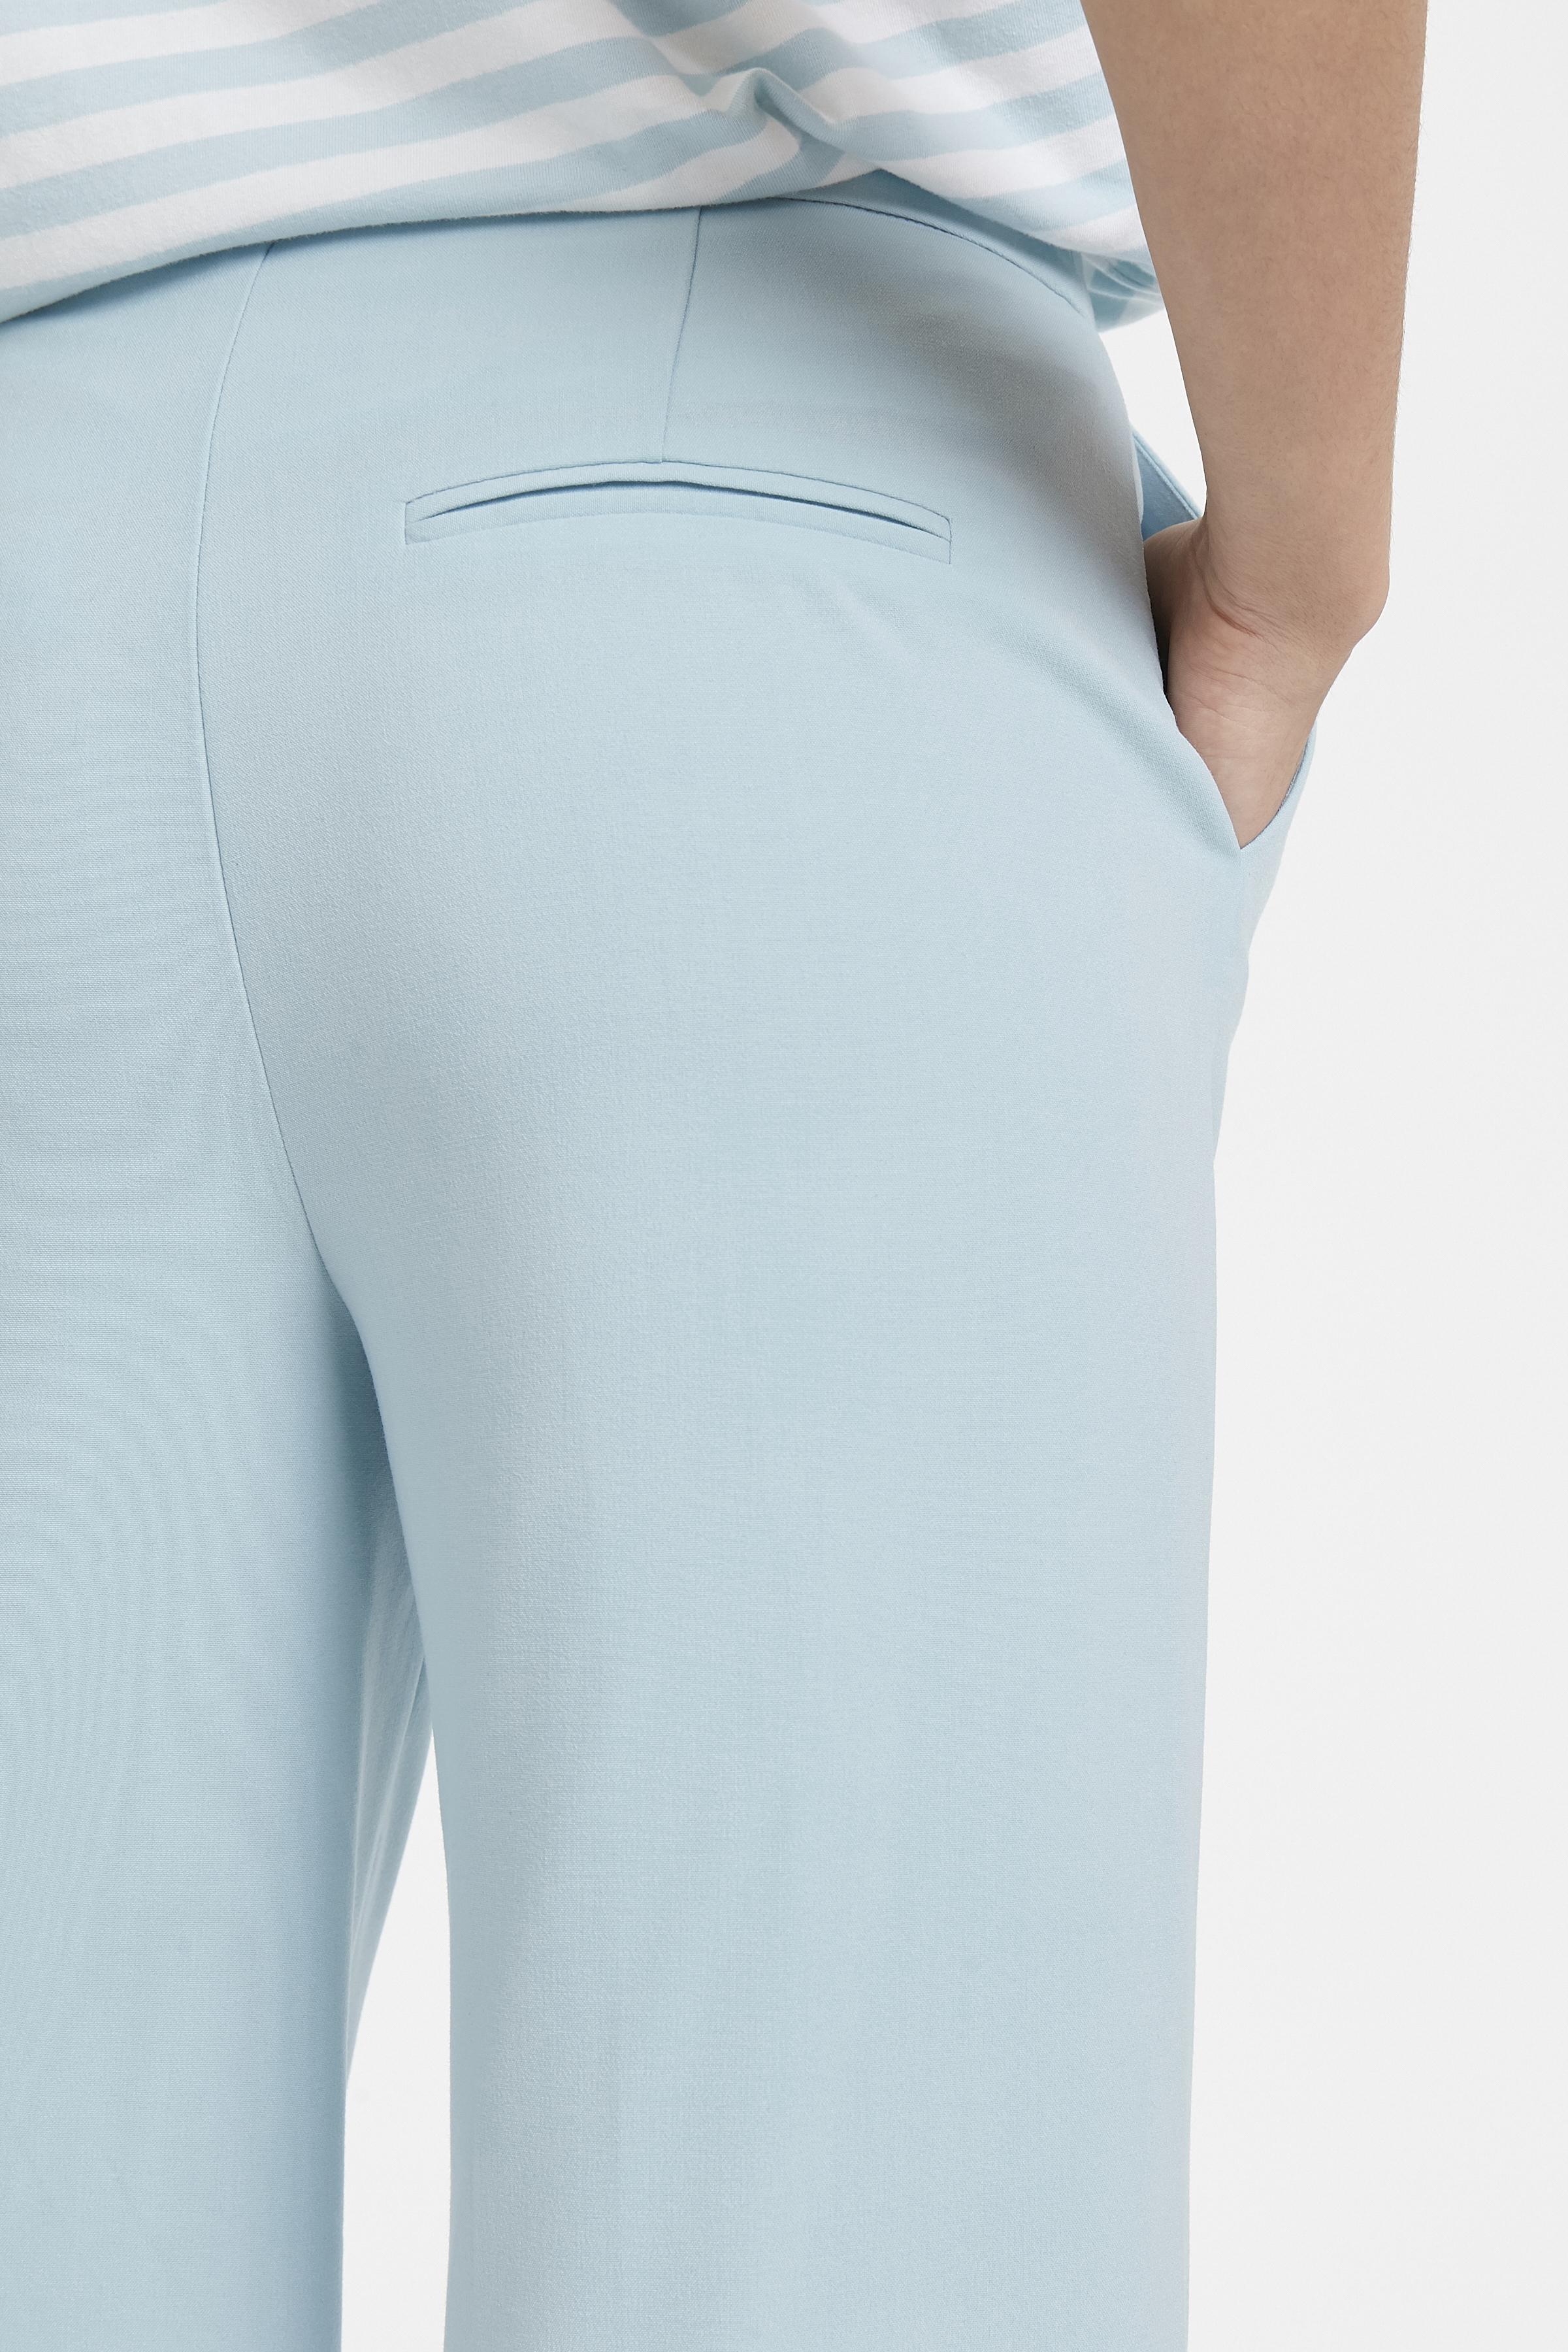 Corydalis Blue Pants Casual – Køb Corydalis Blue Pants Casual fra str. 34-42 her